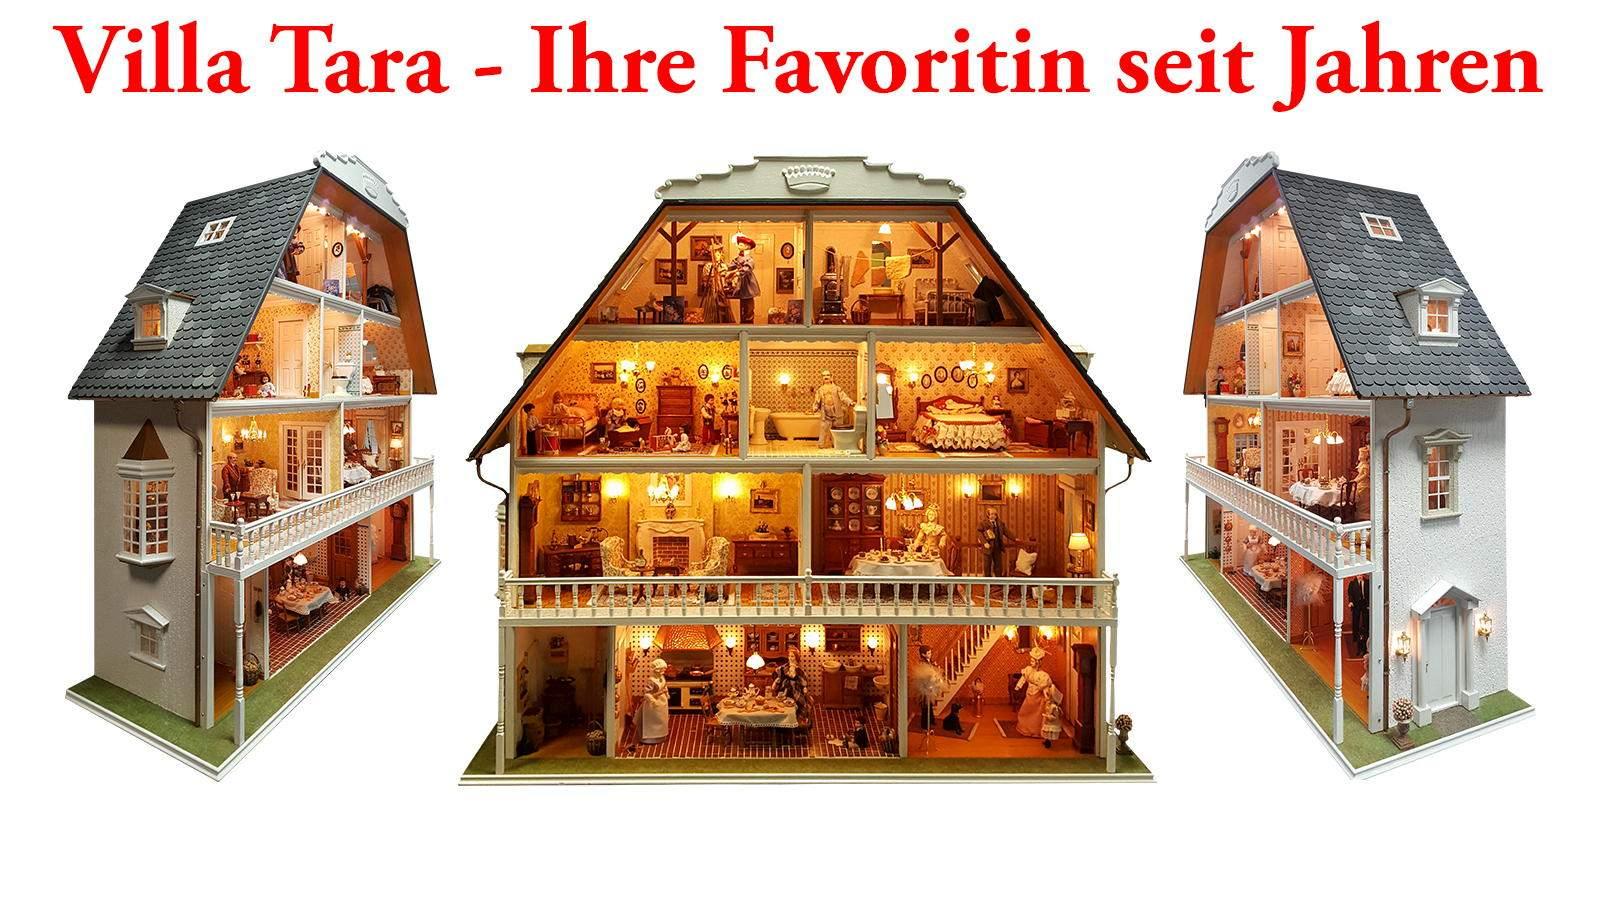 40 Jahre Mini Mundus Miniatur- und Puppenhäuser!